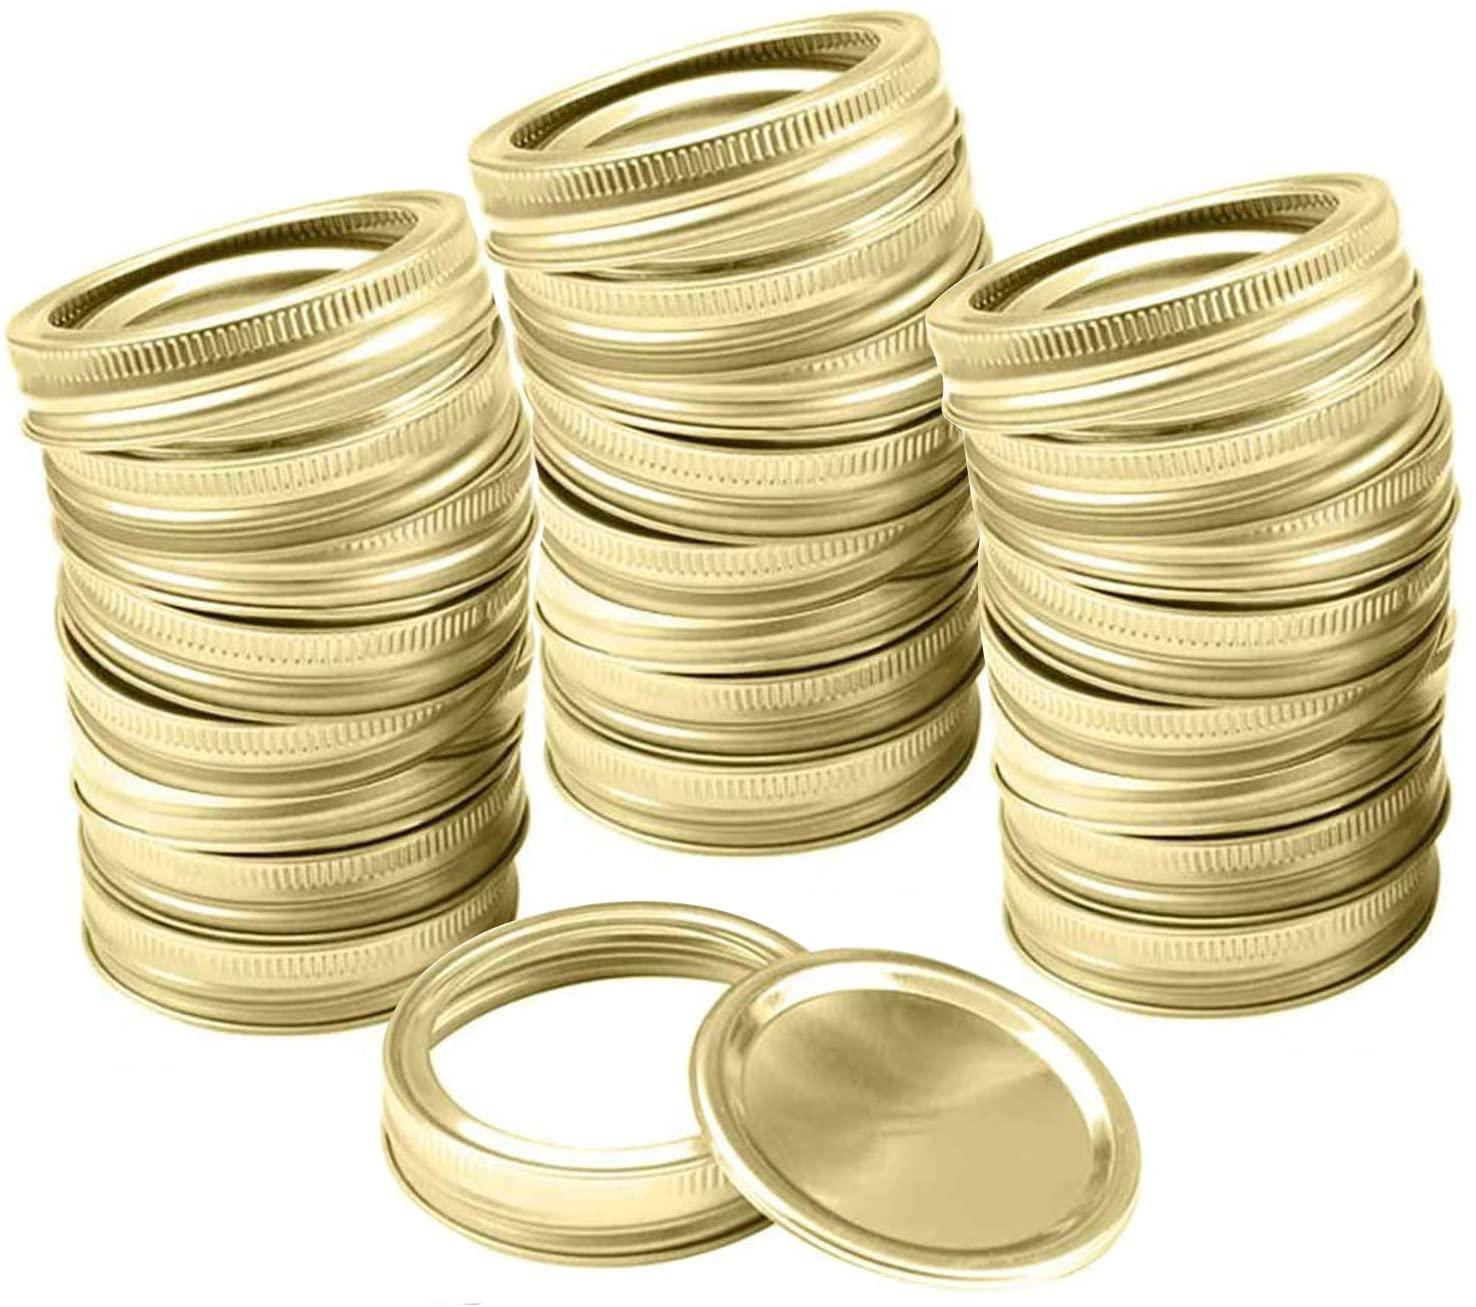 Mason Jar Lids Rings Regular Wide Mouth Canning Lids and Bands (86 mm Wide Mouth, 24 PCS Lids+ 24 PCS Bands)